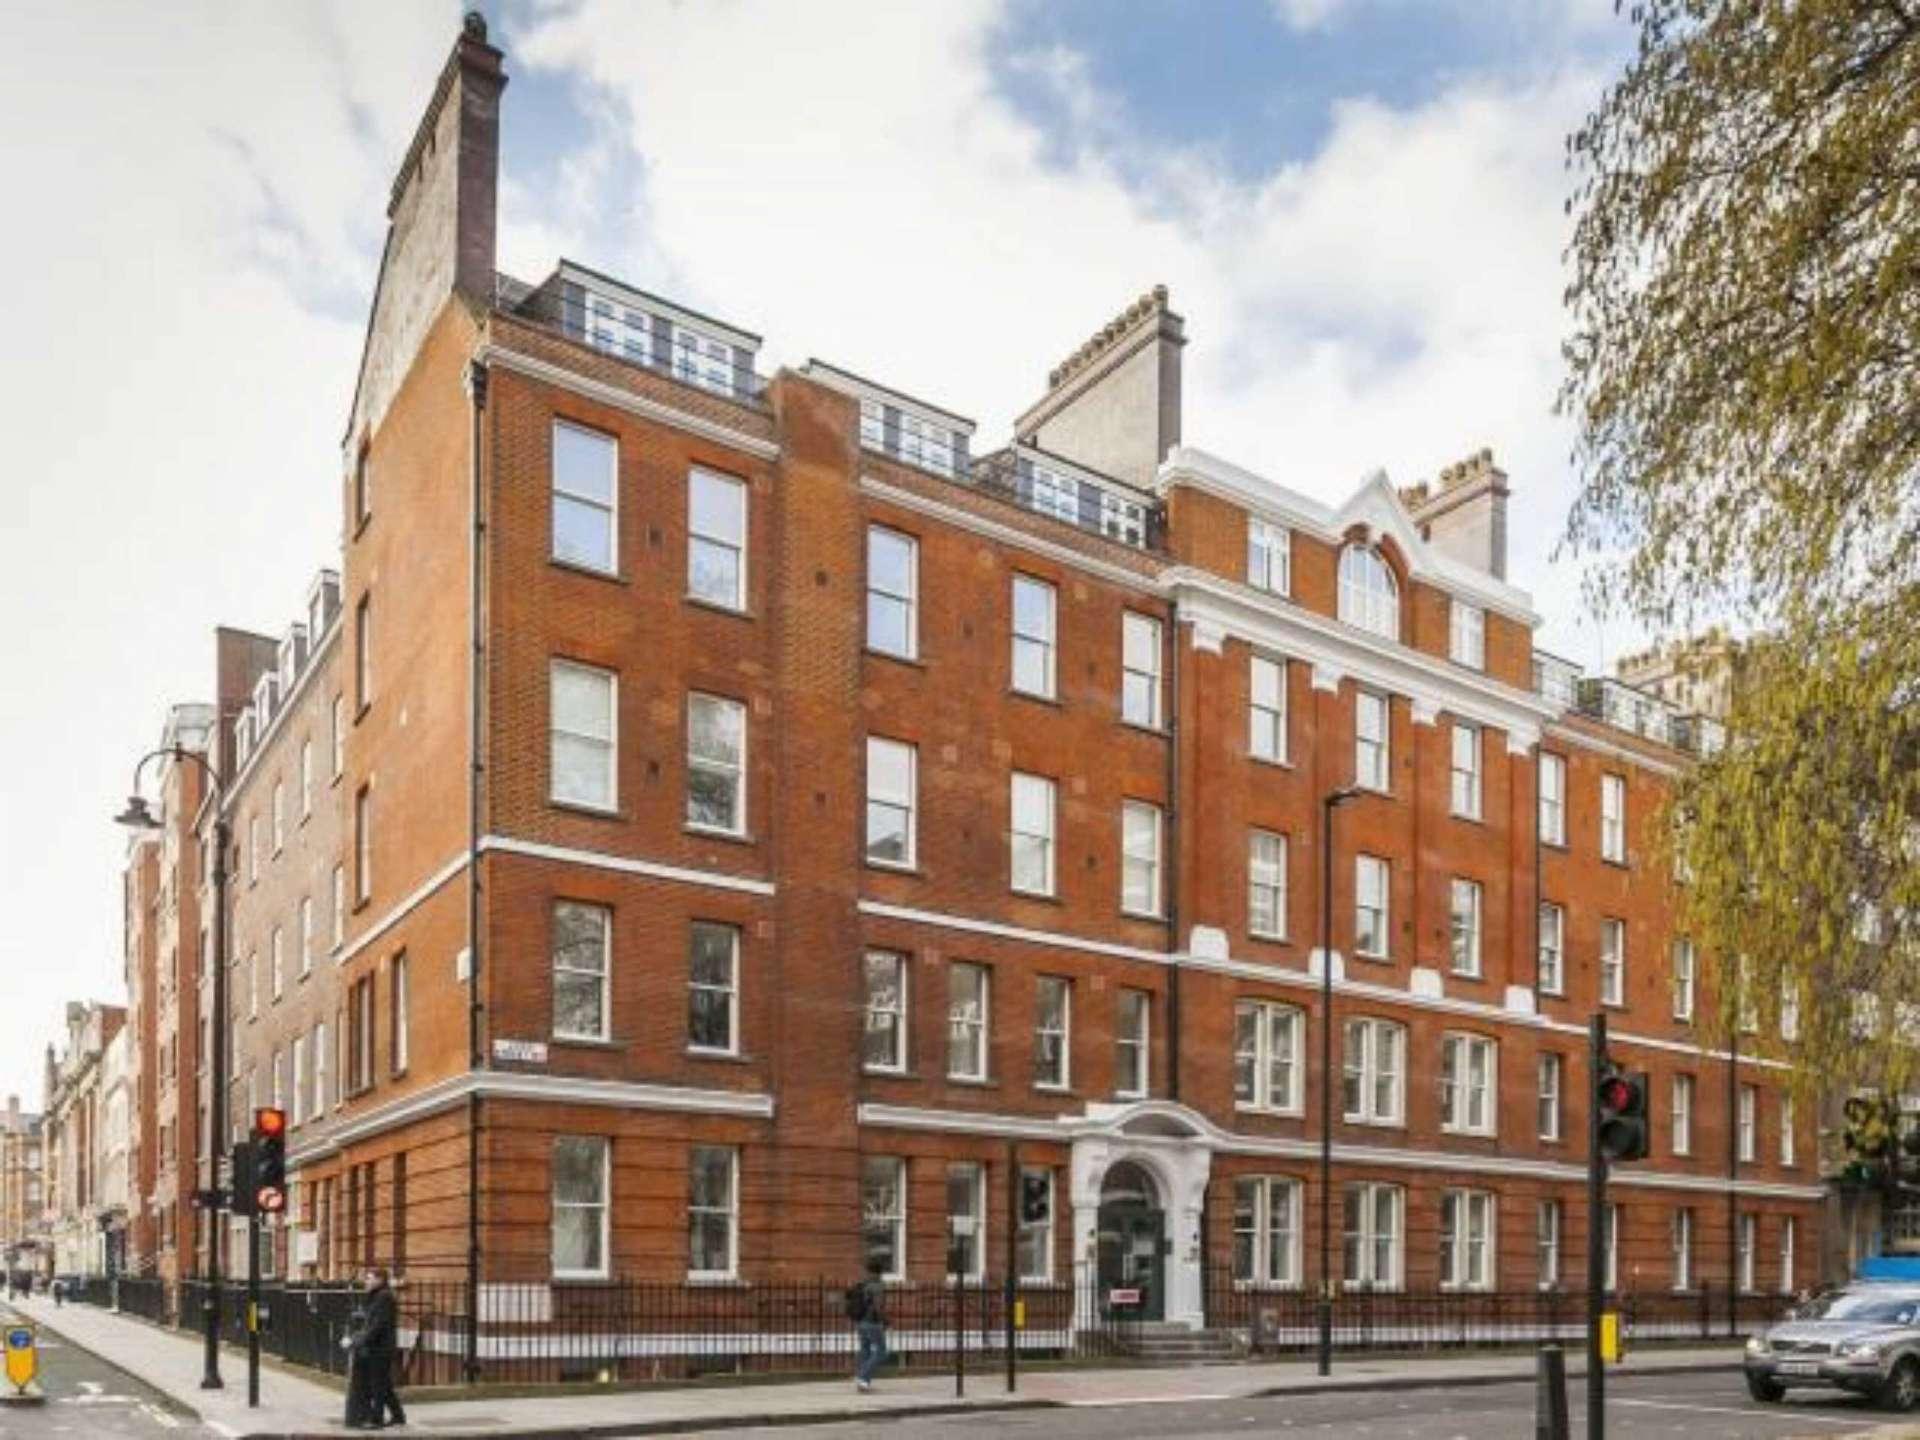 Albany House, 41 Judd Street, Bloomsbury, London, WC1H